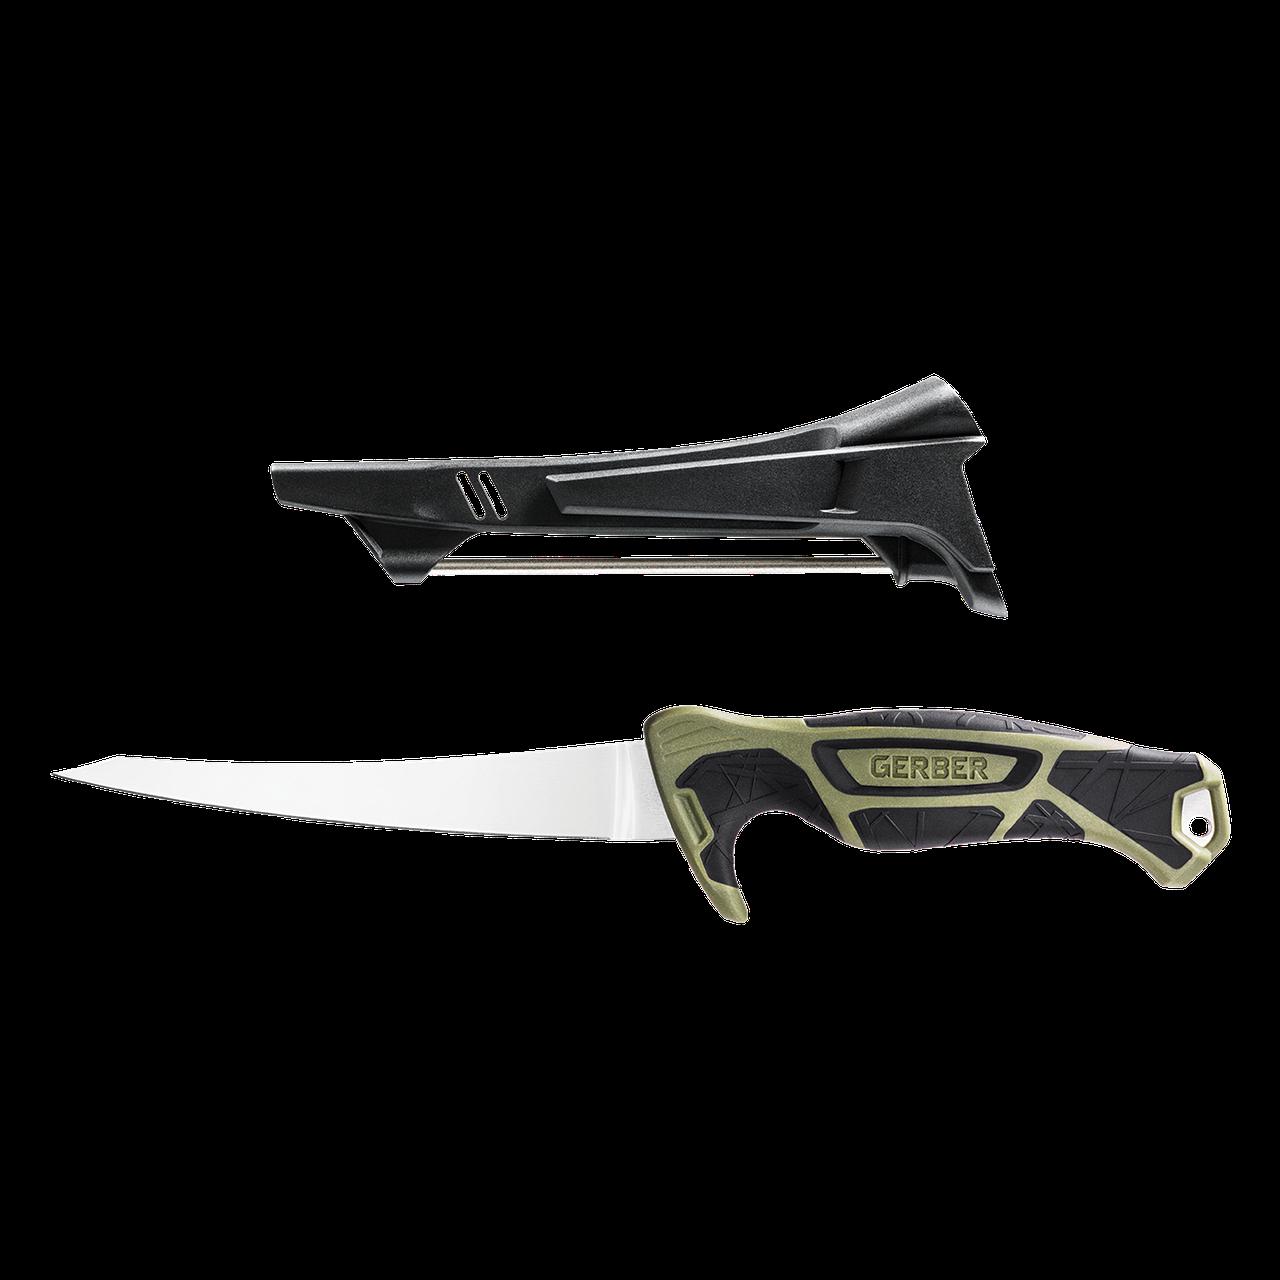 Нож Gerber Controller 6 Fillet Knife